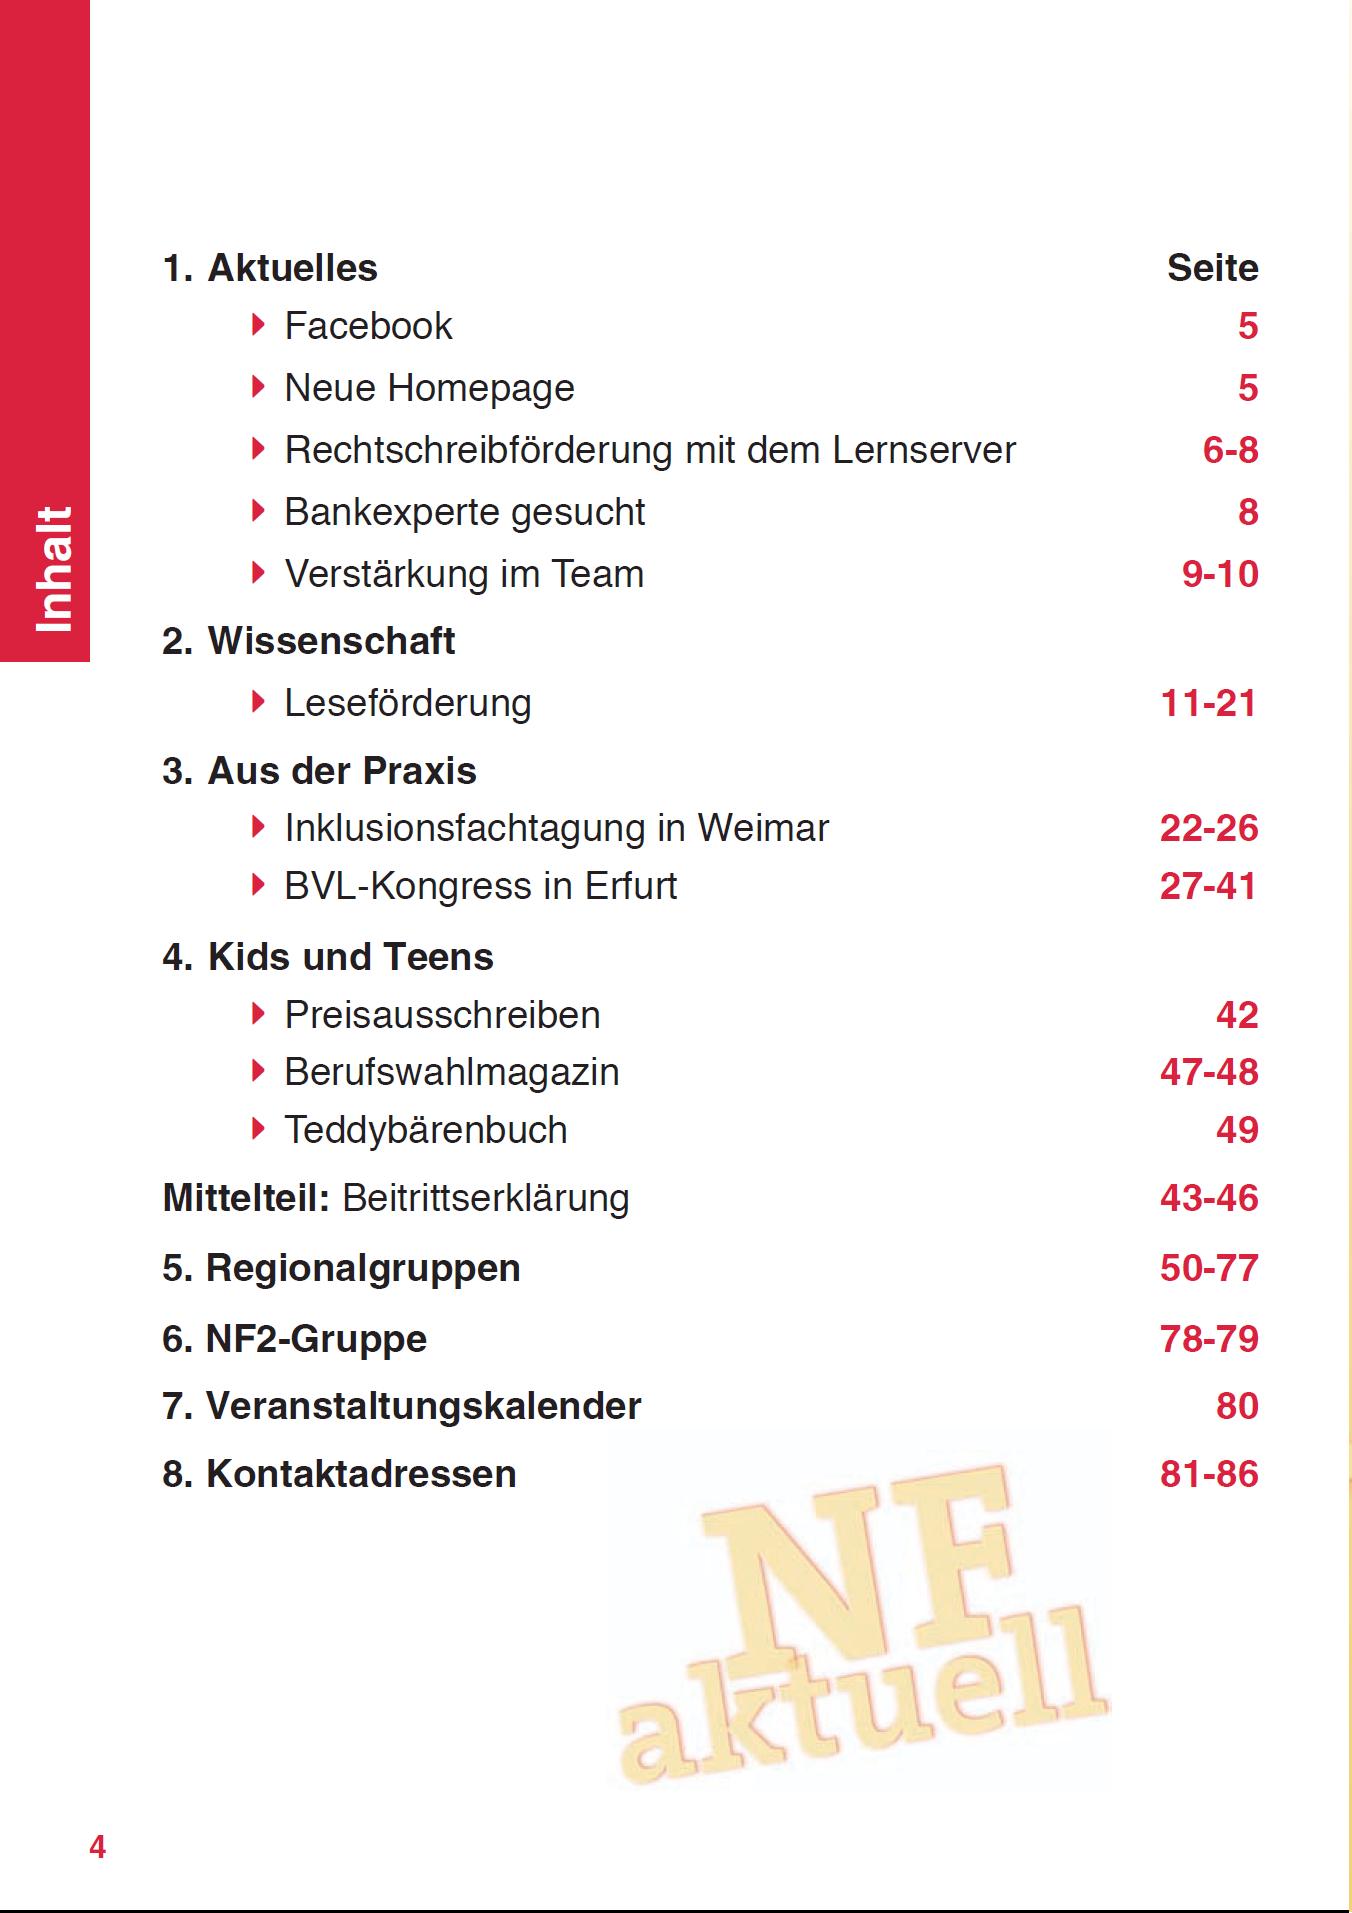 NFaktuell-89-dezember-2014-inhalt